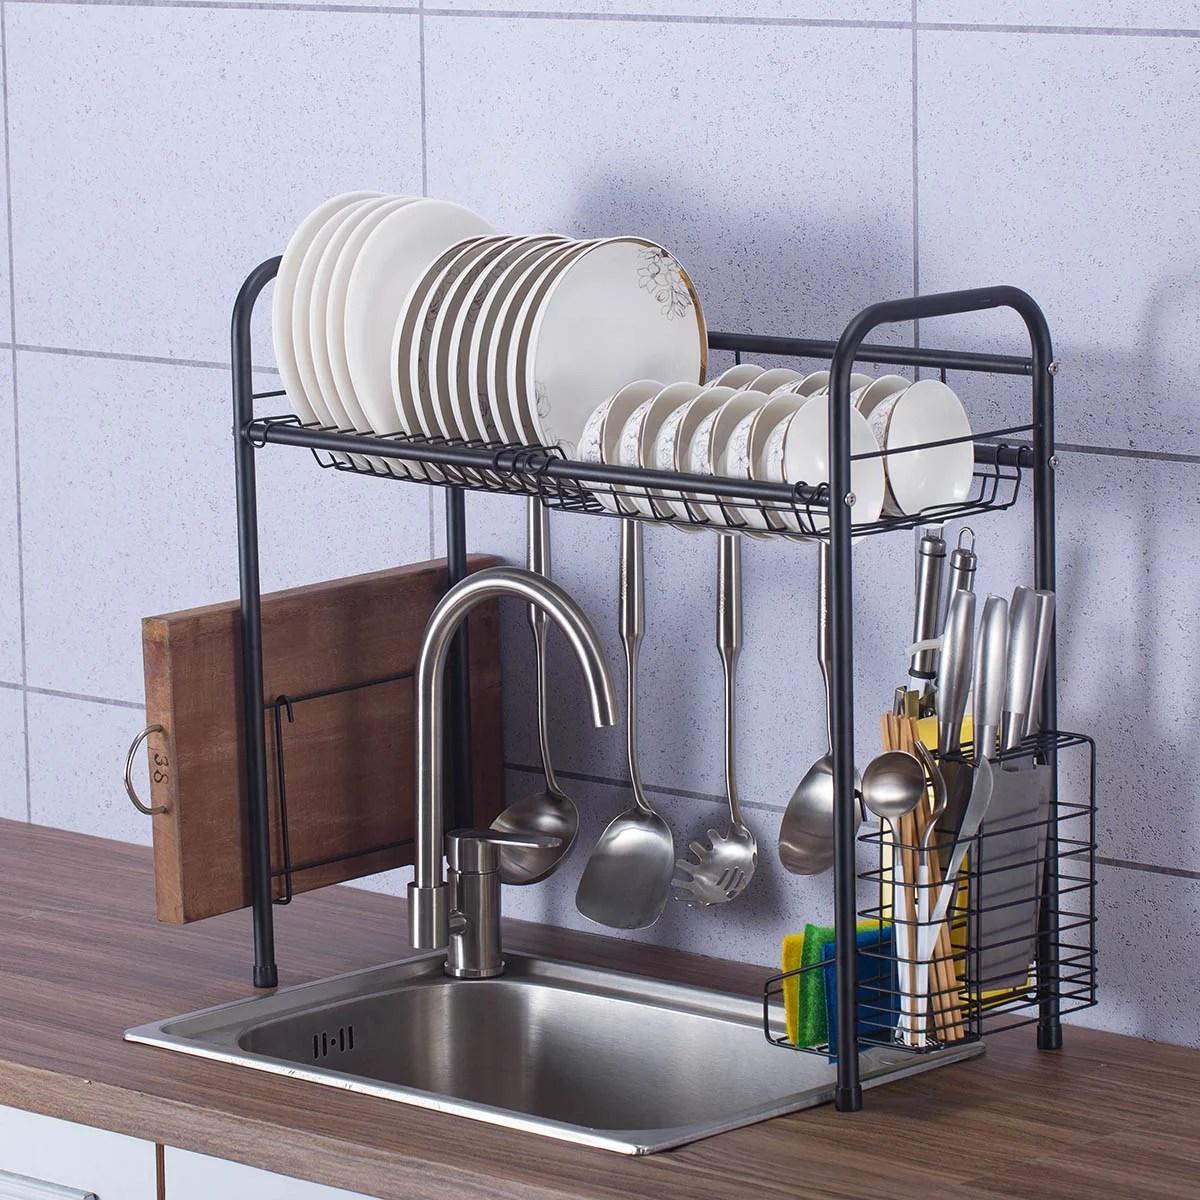 stainless steel dish drying rack over sink drainer shelf storage rack kitchen cutlery utensils holder